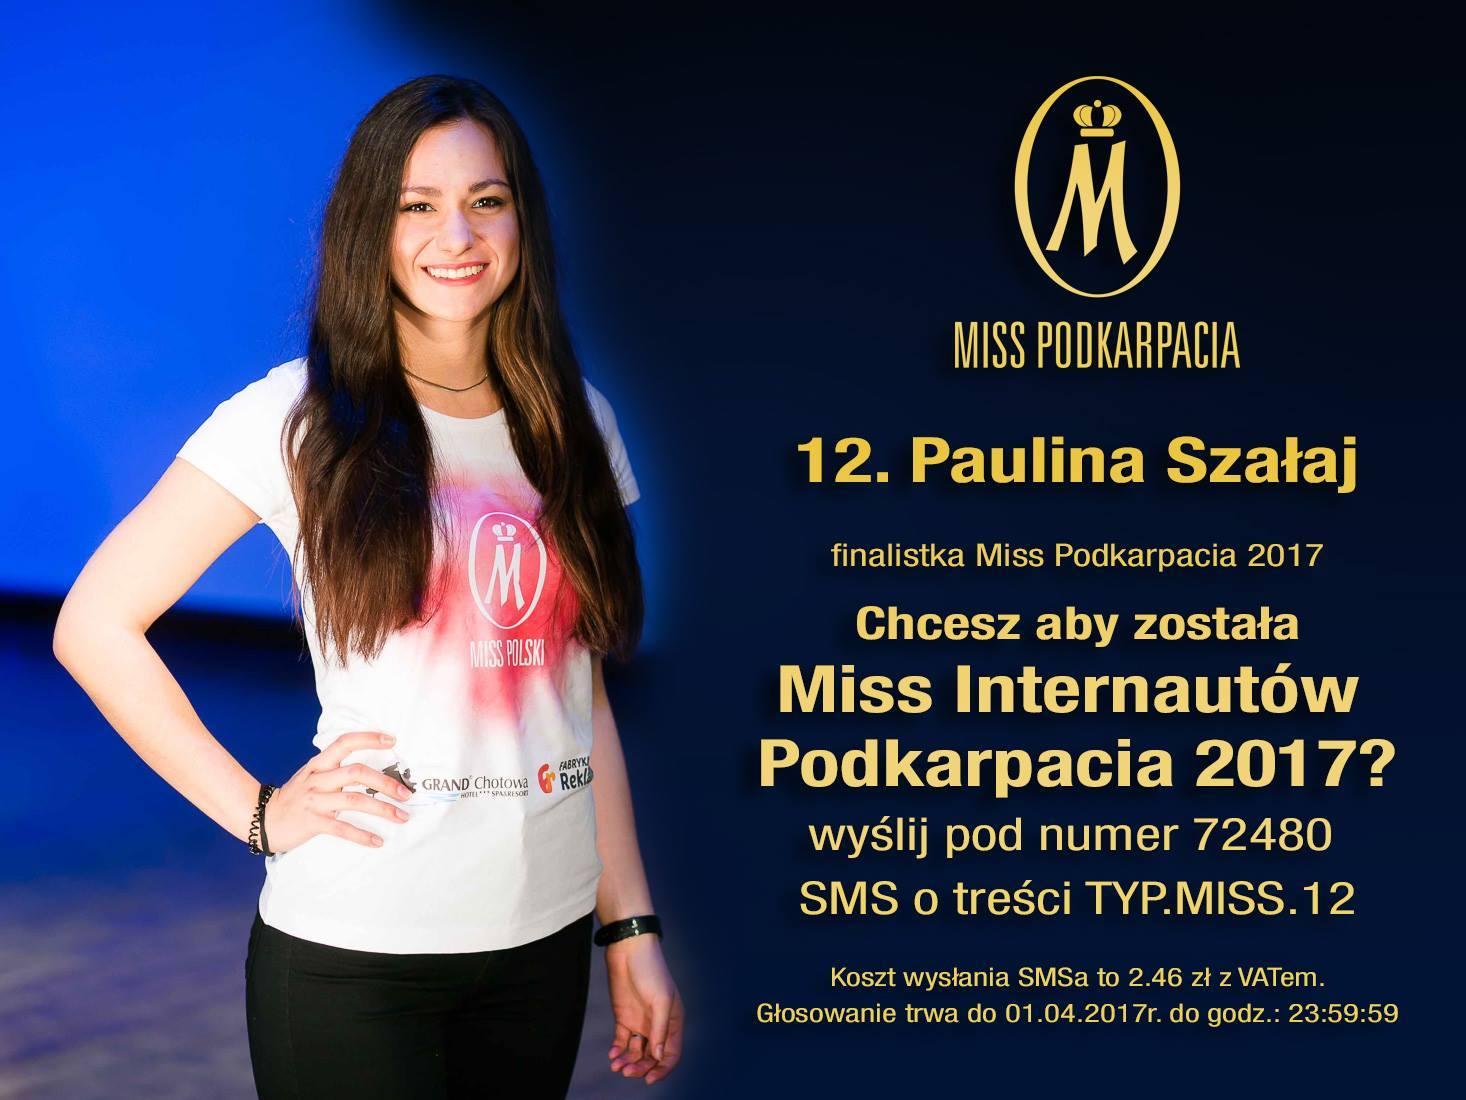 paulina-szalaj-miss-podkarpacia